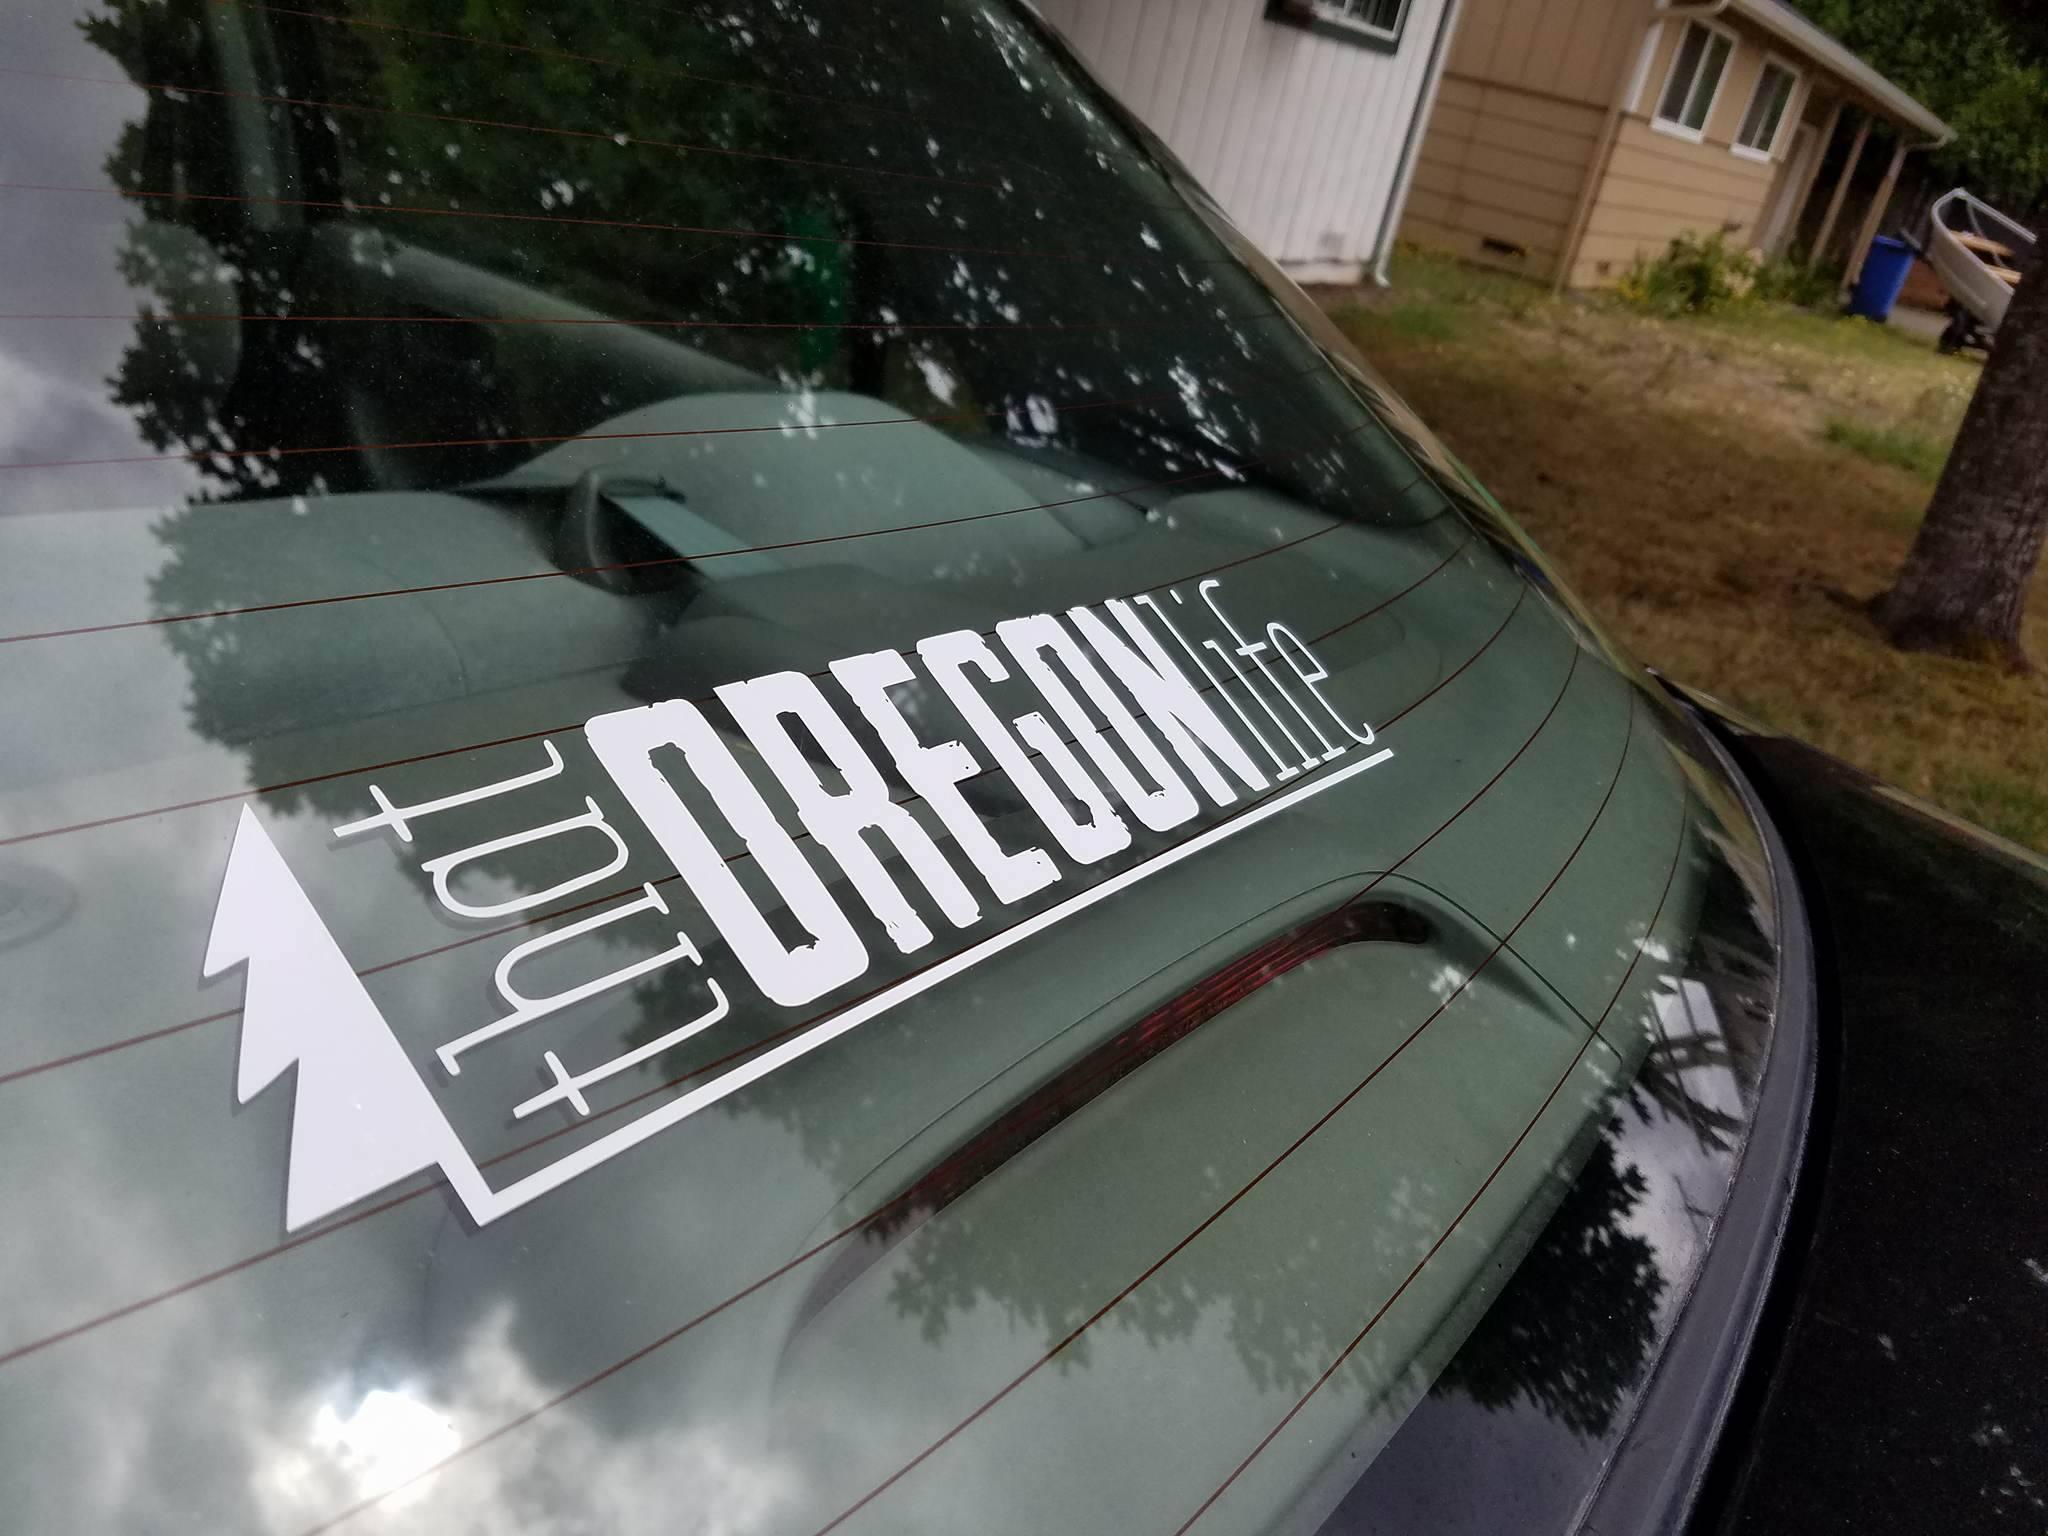 Oregon stickers